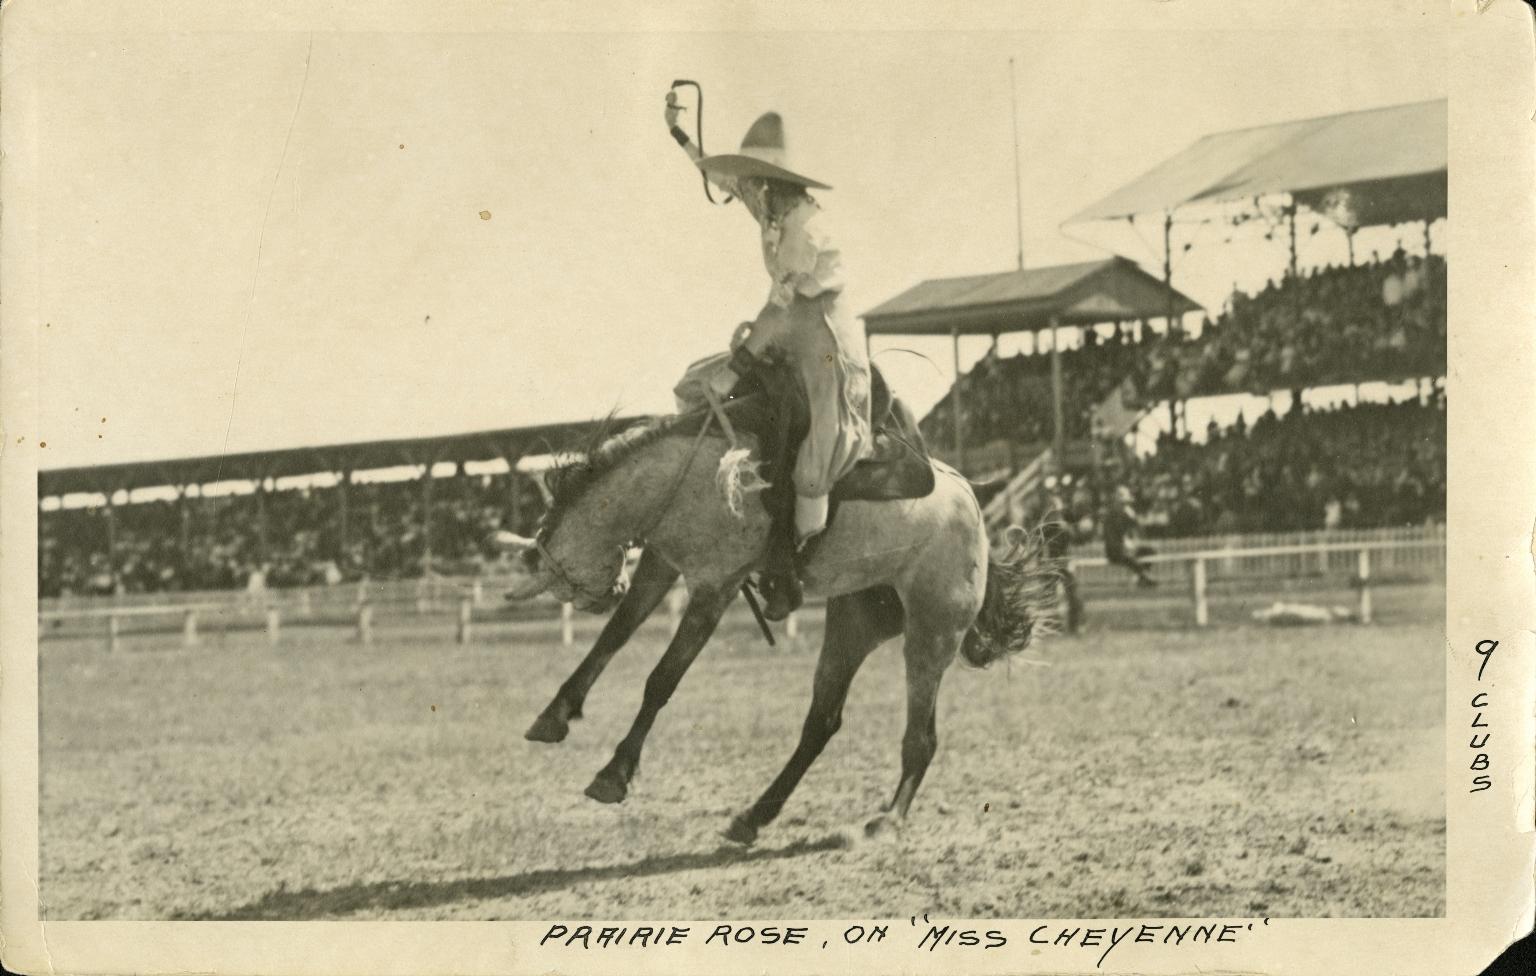 Prairie Rose Henderson riding bronco